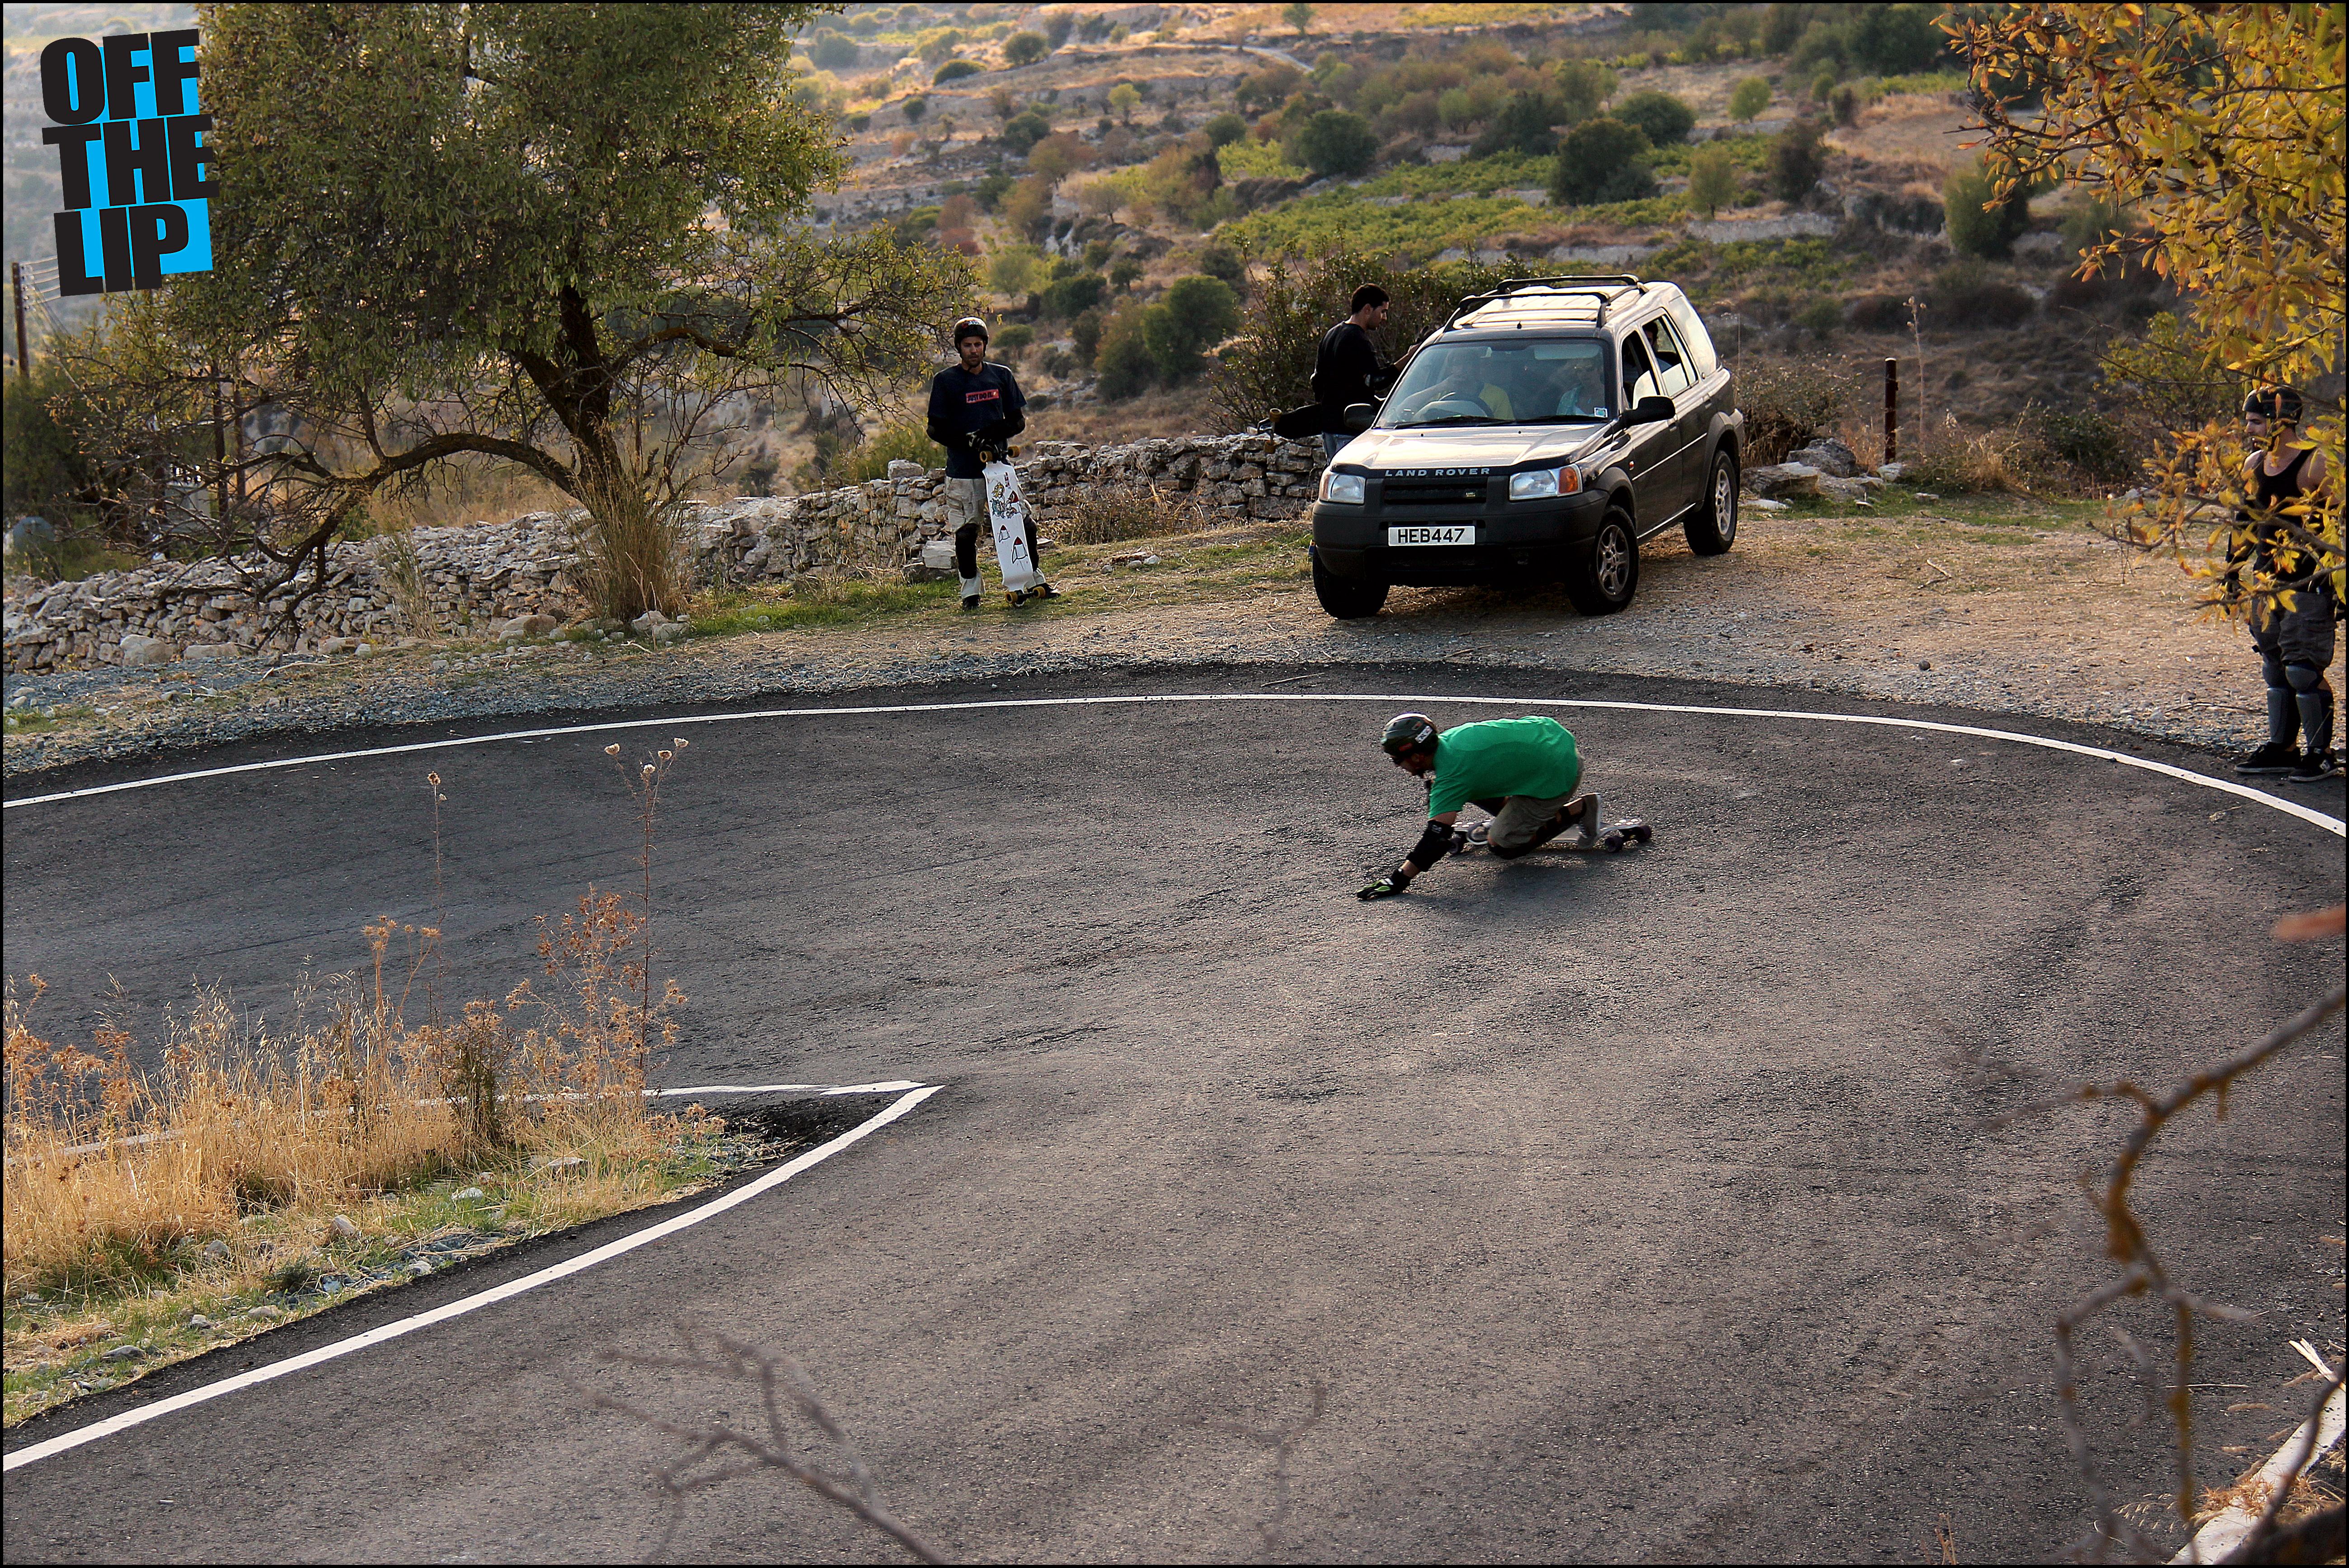 longboarding Cyprus, skate, Cyprus, protection gear